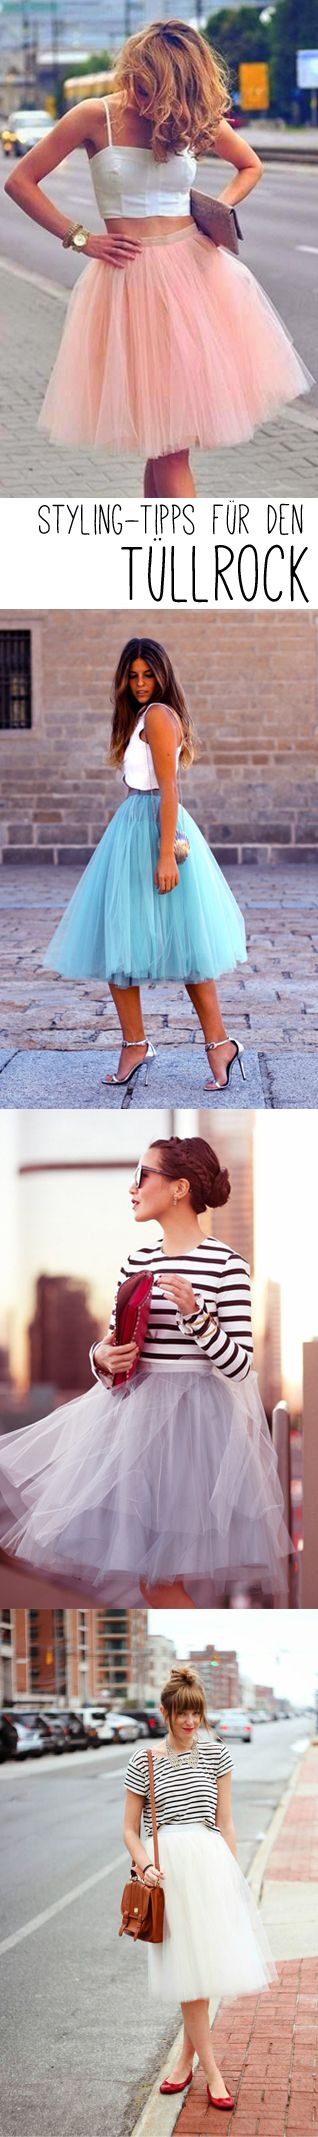 Die coolsten Styles mit Tüllrock - jetzt auf http://www.gofeminin.de/styling-tipps/tullrock-styling-tipps-s1412681.html #tulleskirt #fashion #trend #streetstyle #style #romantic